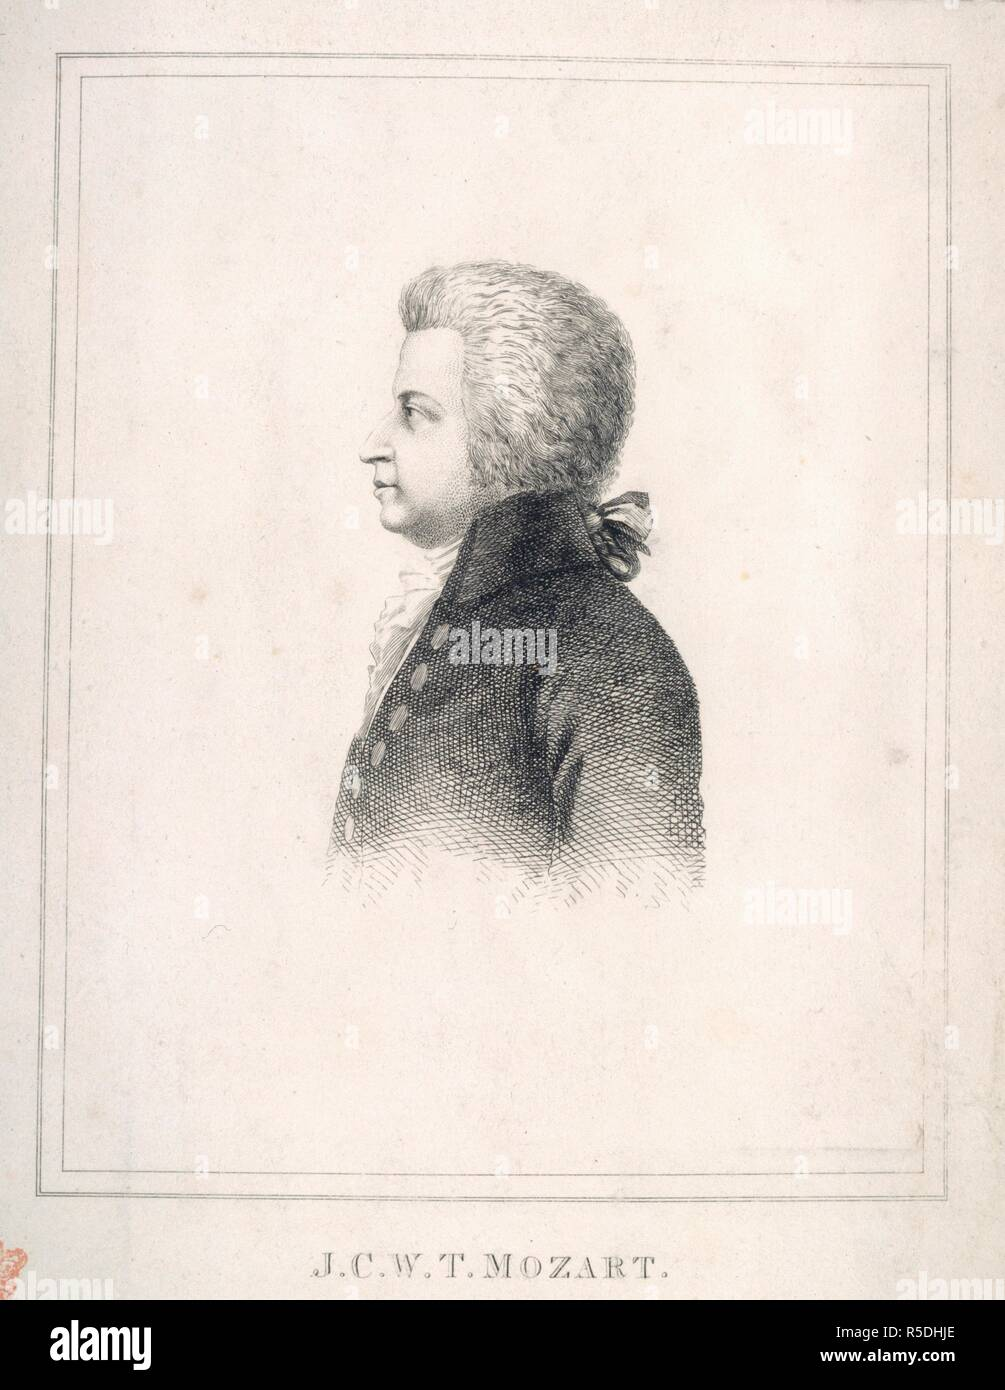 Visual Mozart Stock Photos & Visual Mozart Stock Images - Alamy